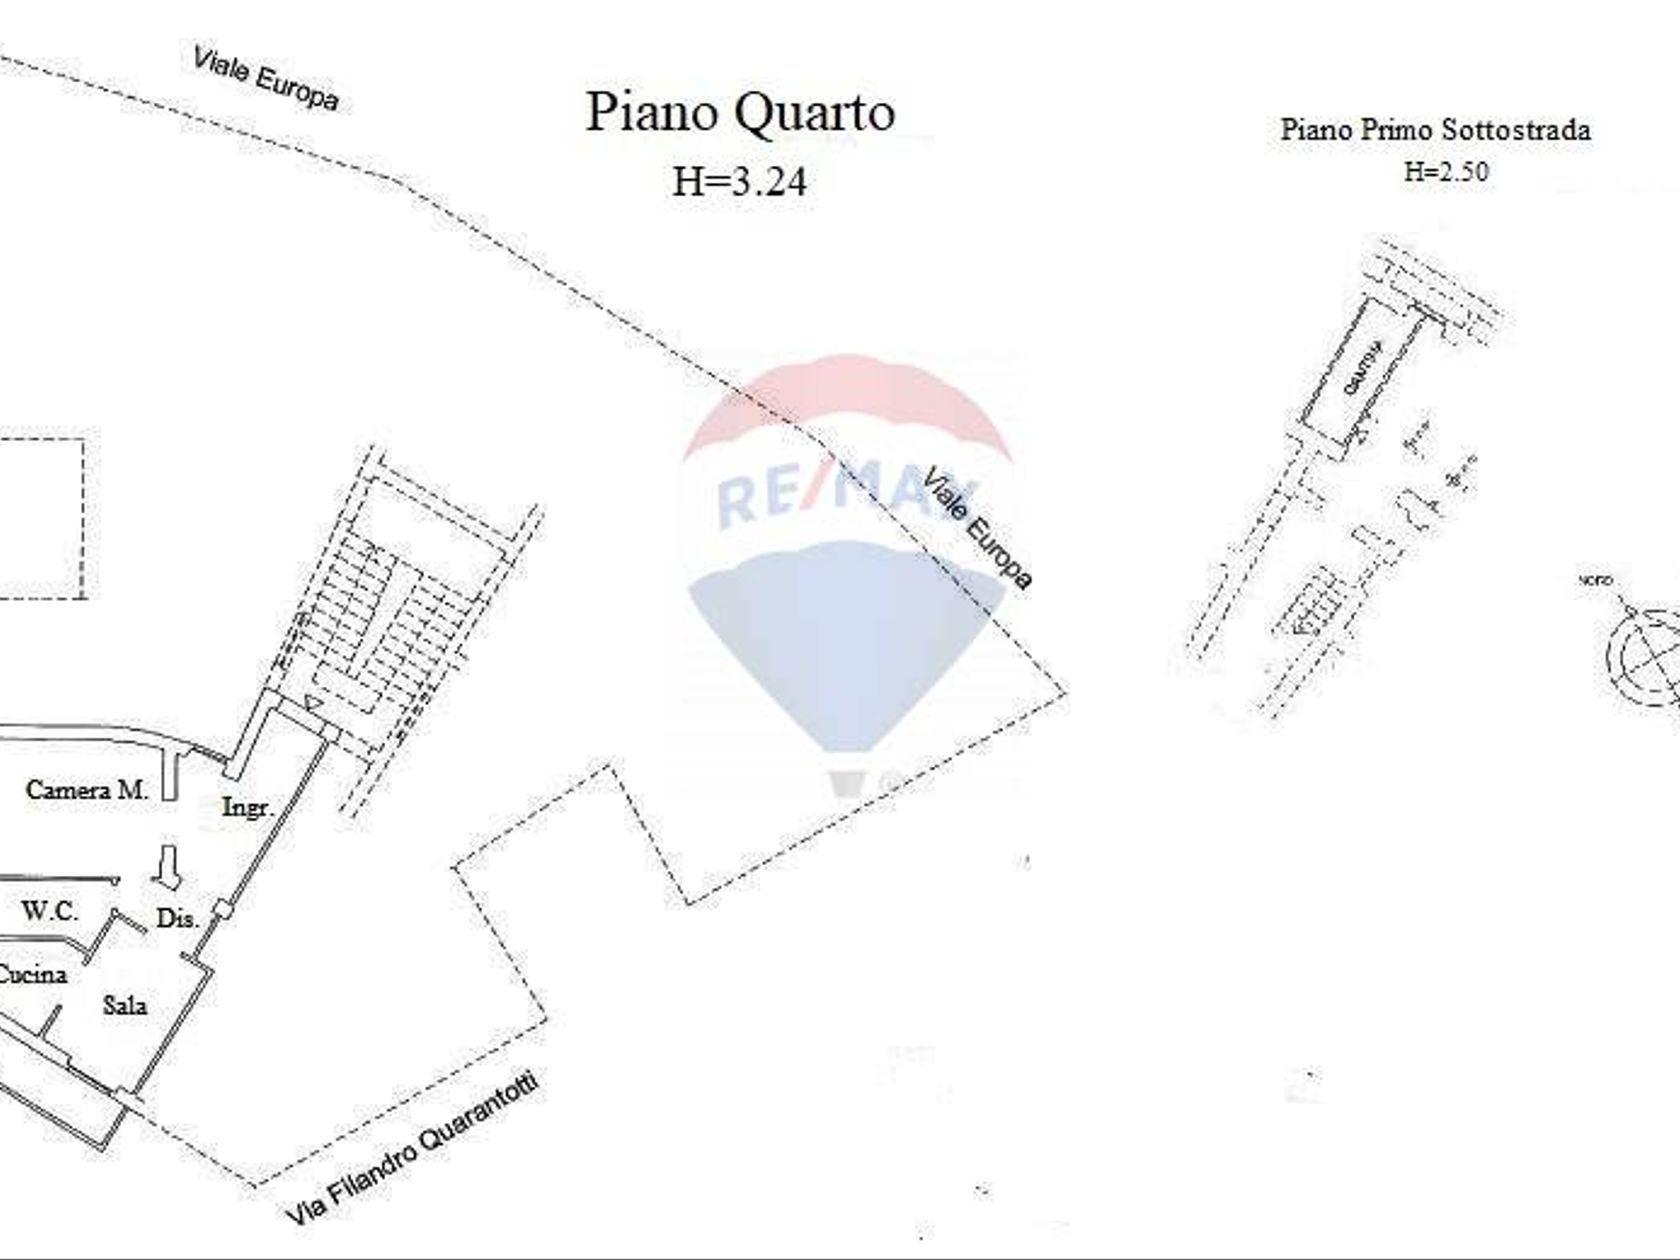 Appartamento V. Europa, Chieti, CH Vendita - Planimetria 1